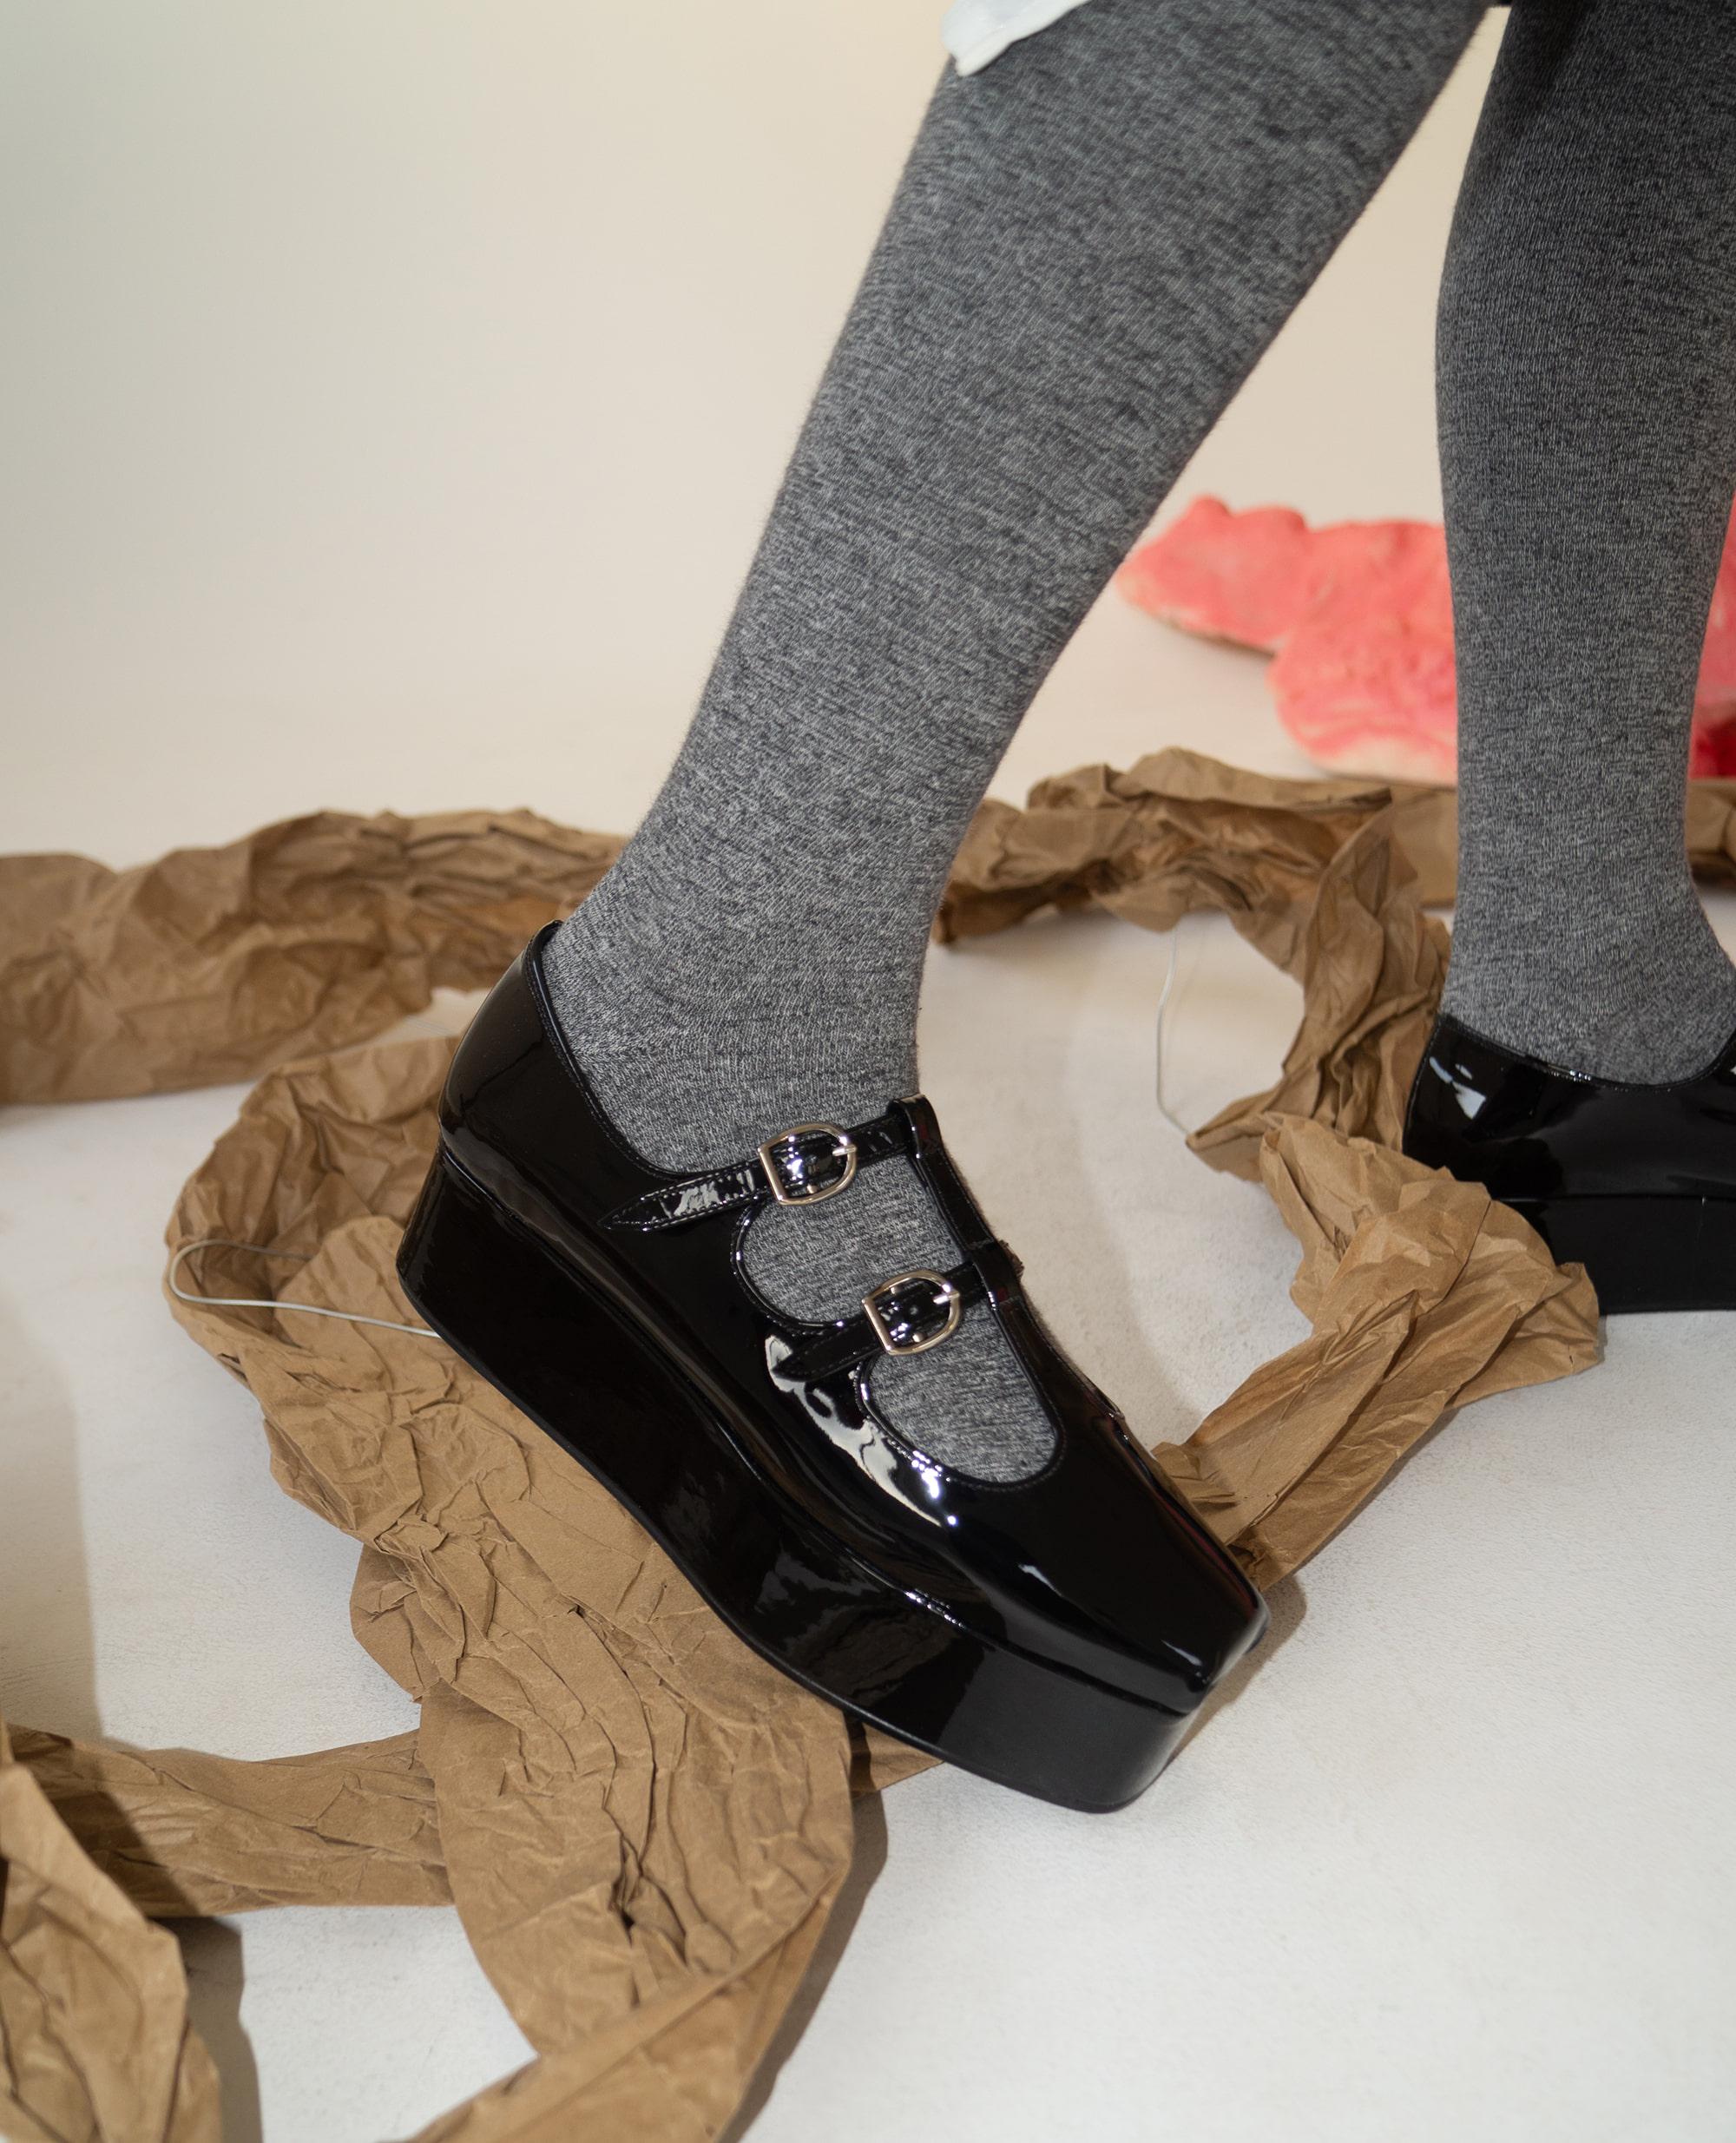 Ballet Toe T-strap platforms | Glossy black